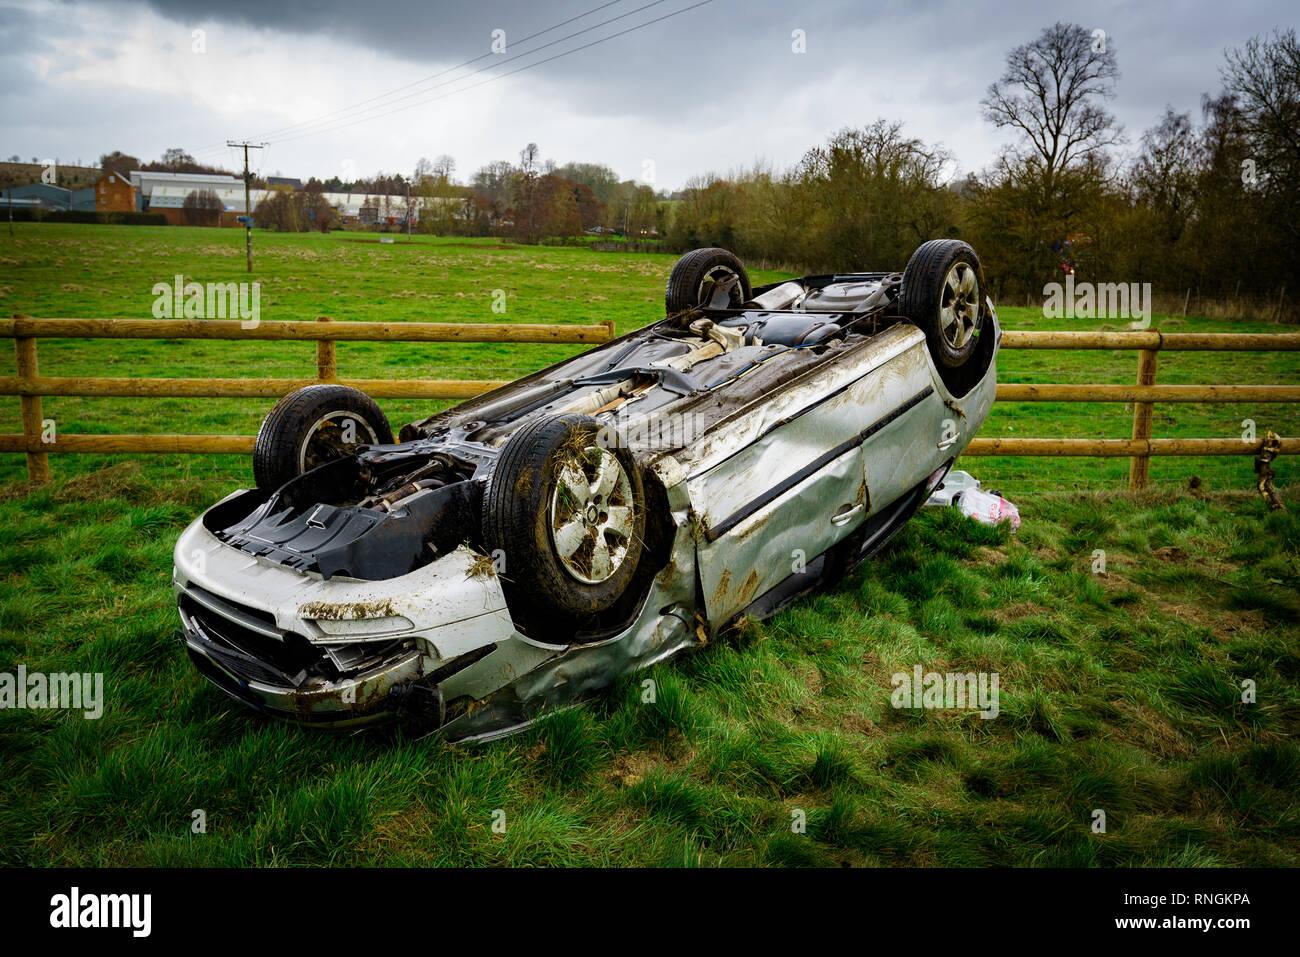 Car Crash and Car Damage  Vehicle crashed through a fence after high